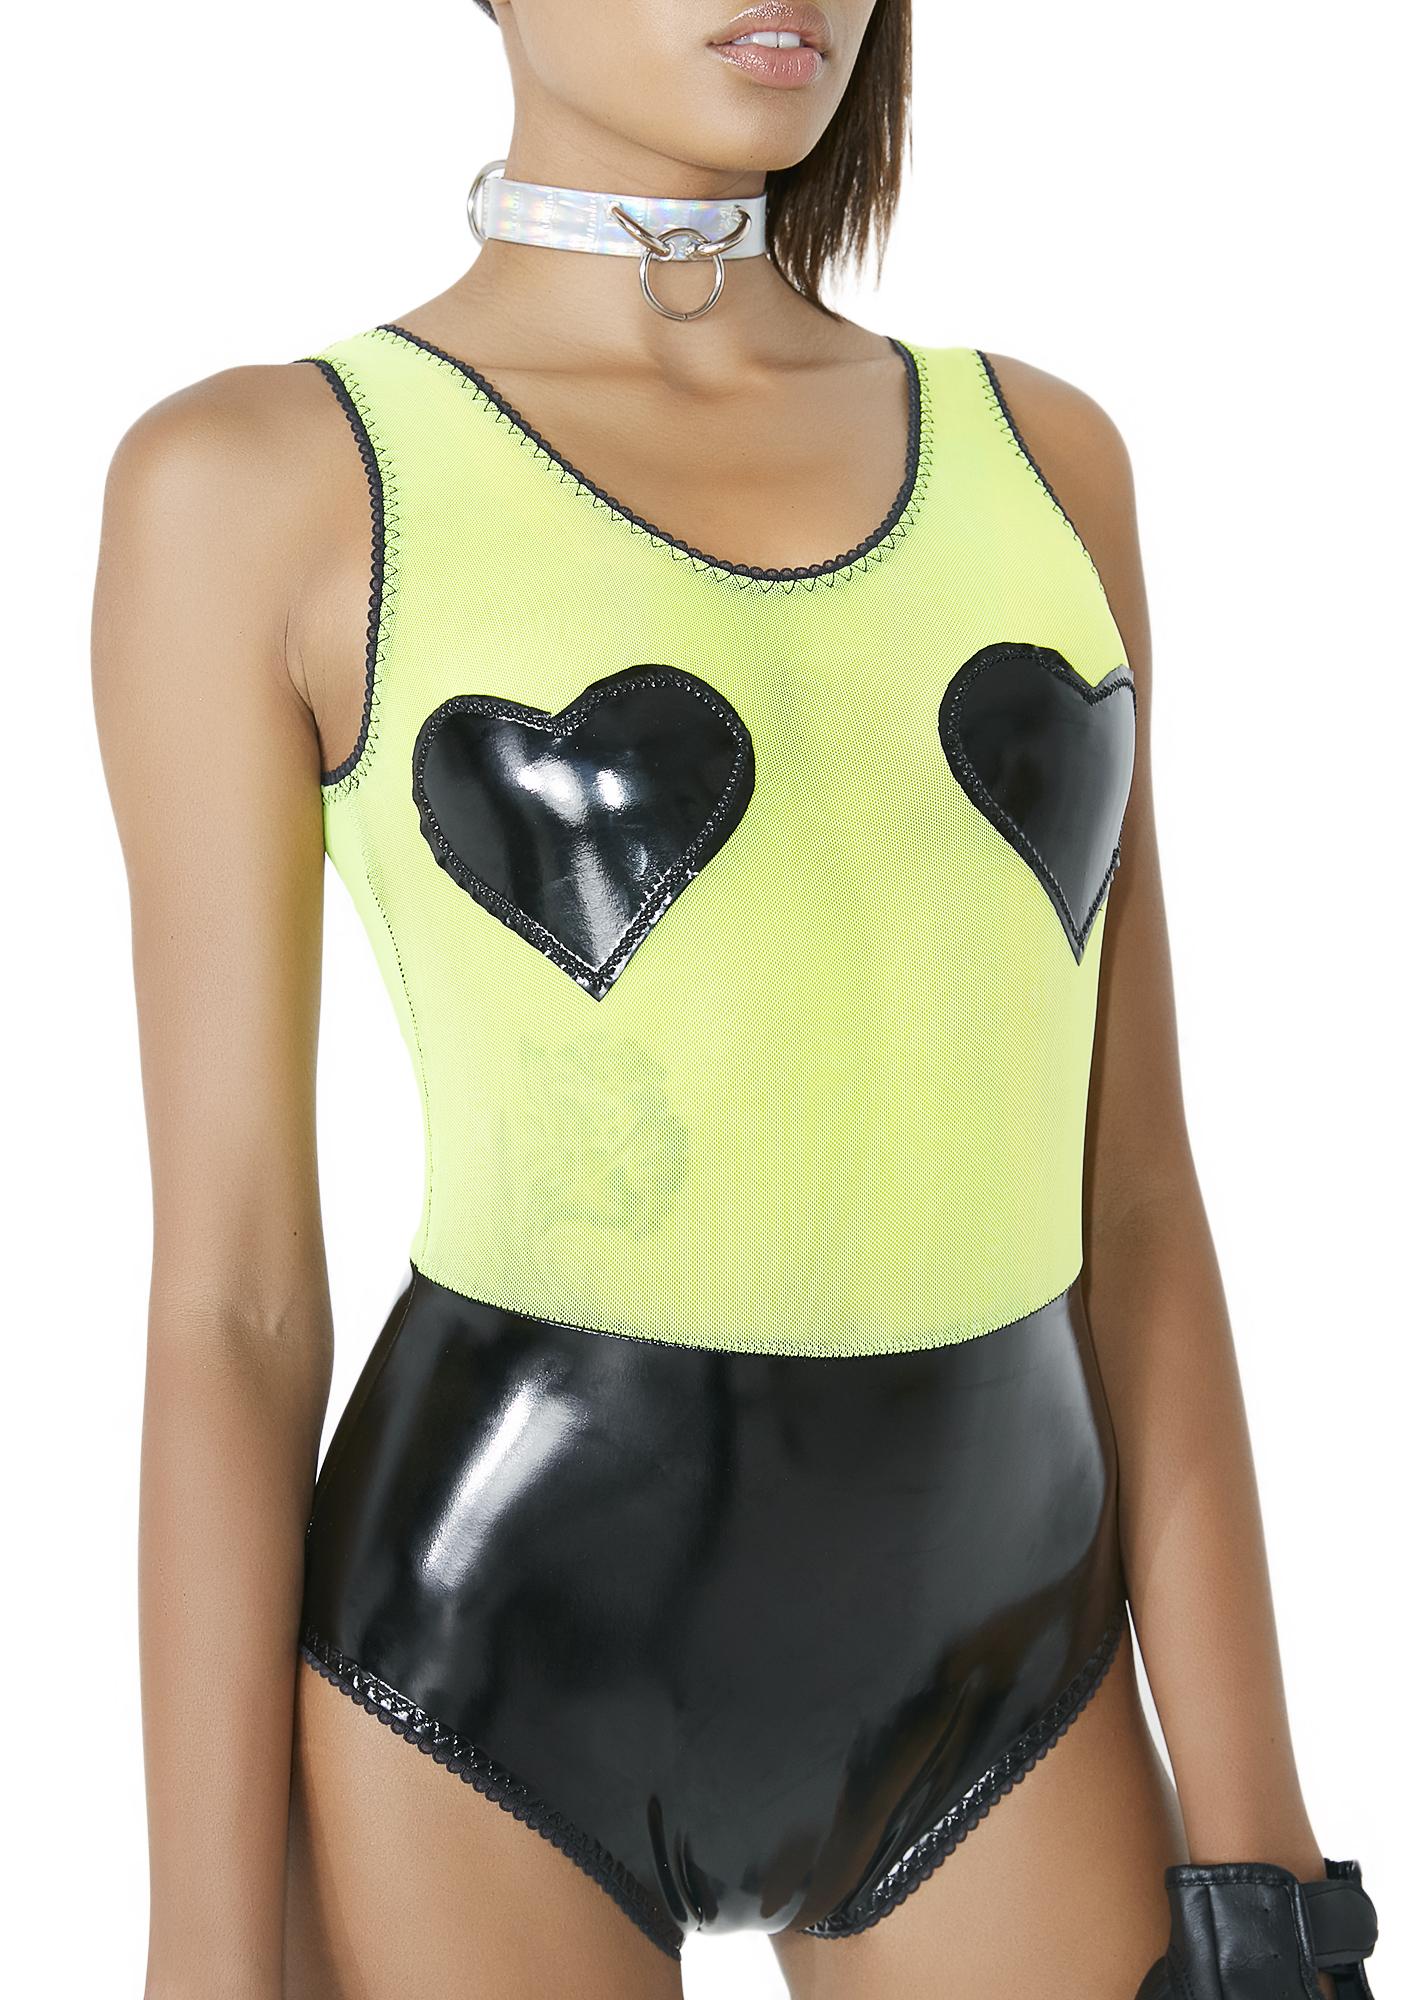 Neon Sheer Latex Bodysuit Heart Appliques Black